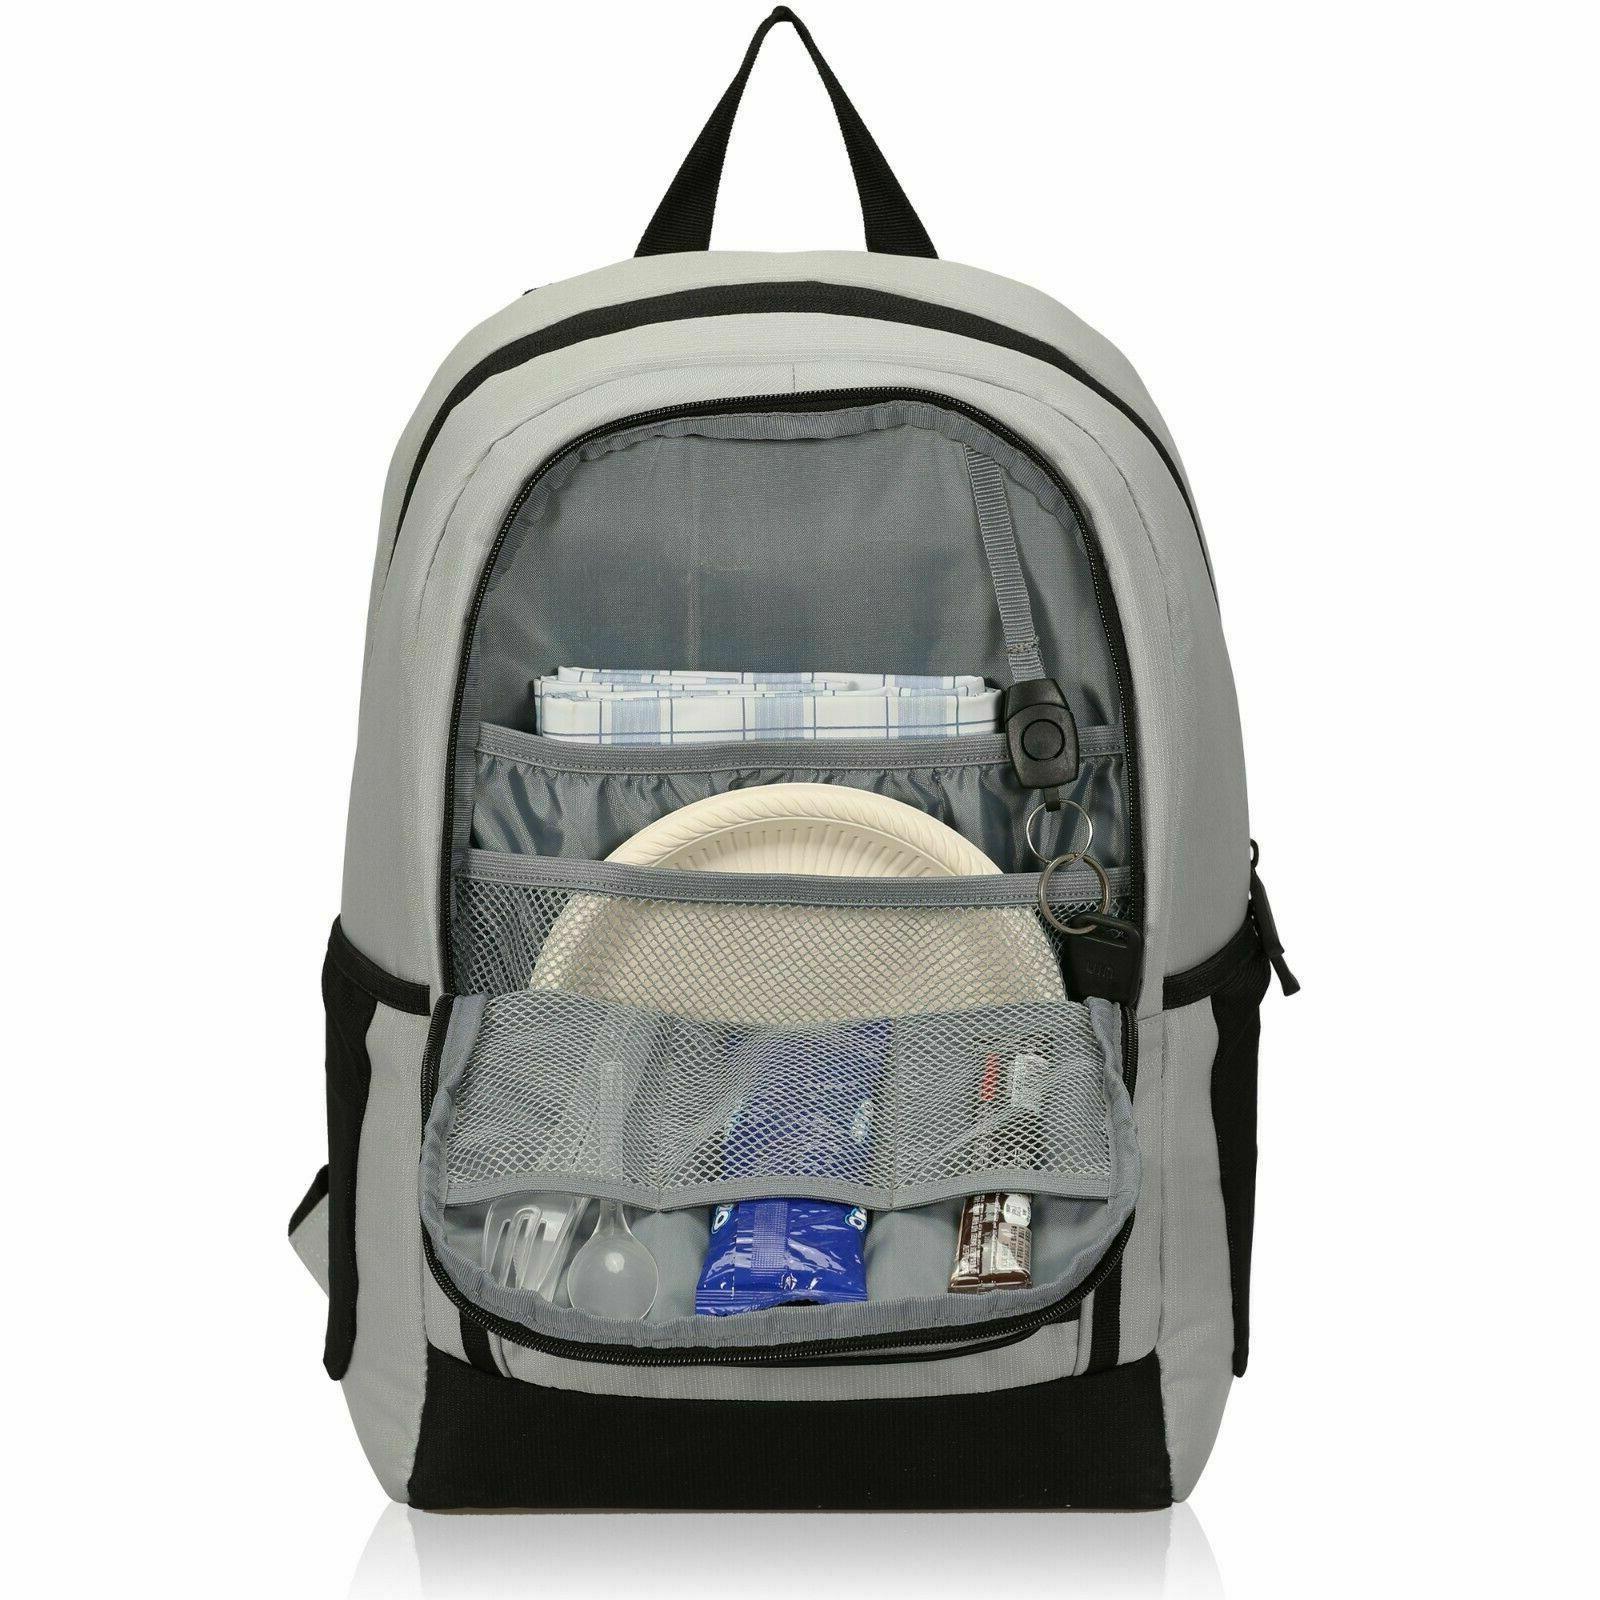 27 Cooler Leakproof Bag Thermal Camping